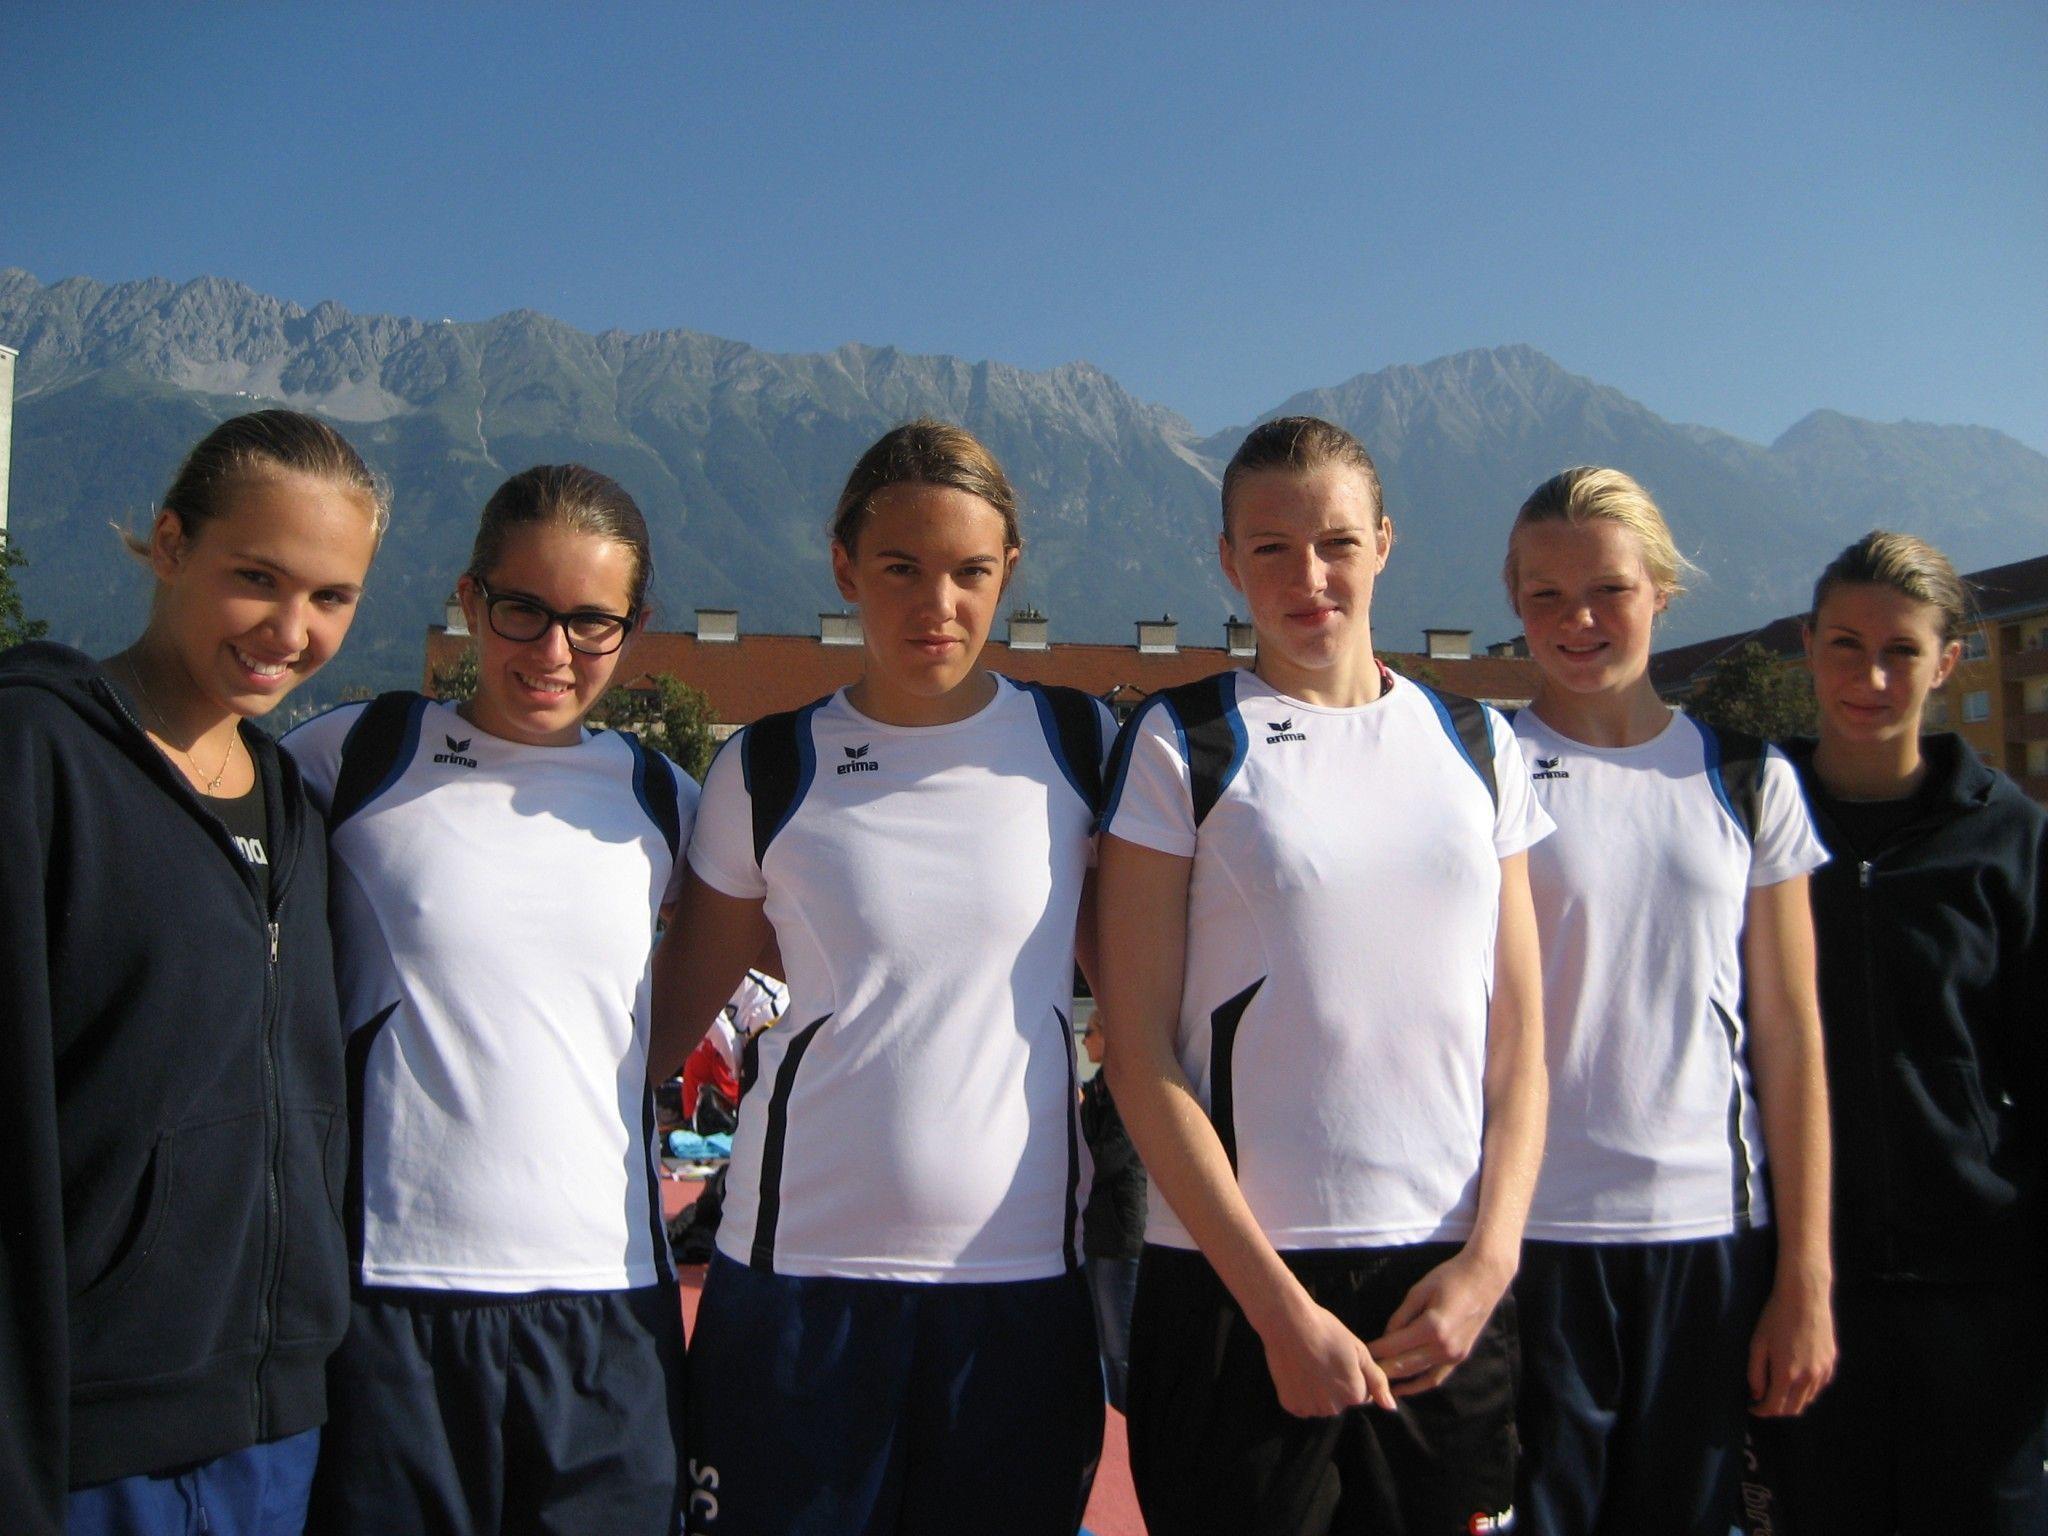 Frauenpower in Innsbruck vlnr: Celina, Katharina, Magdalena, Vera-Maria, Johanna und Nena